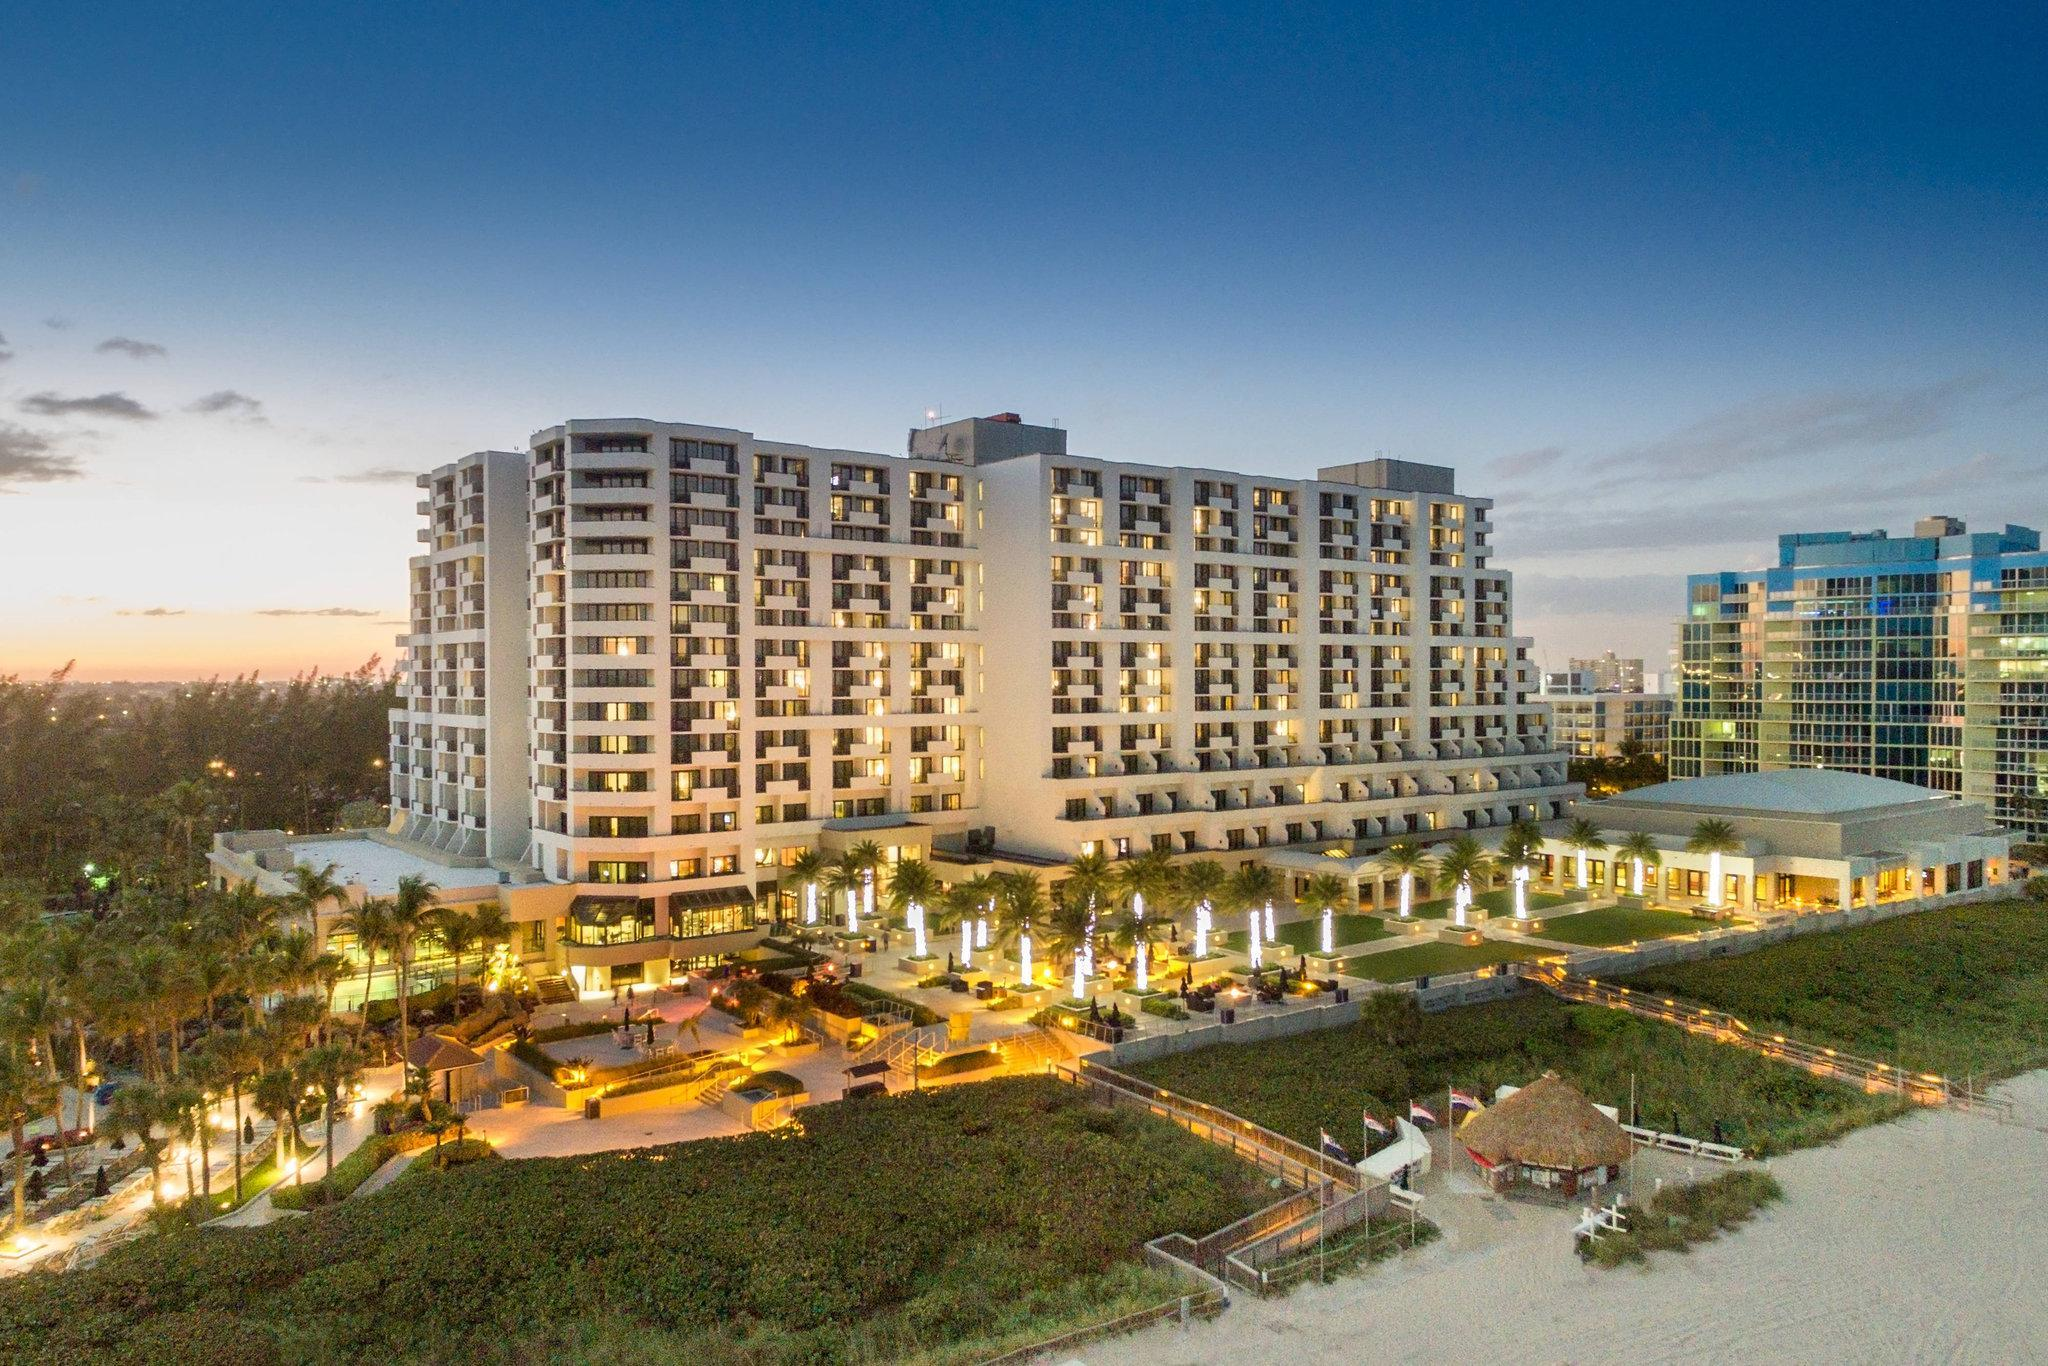 Fort Lauderdale Marriott Harbor Beach Resort And Spa